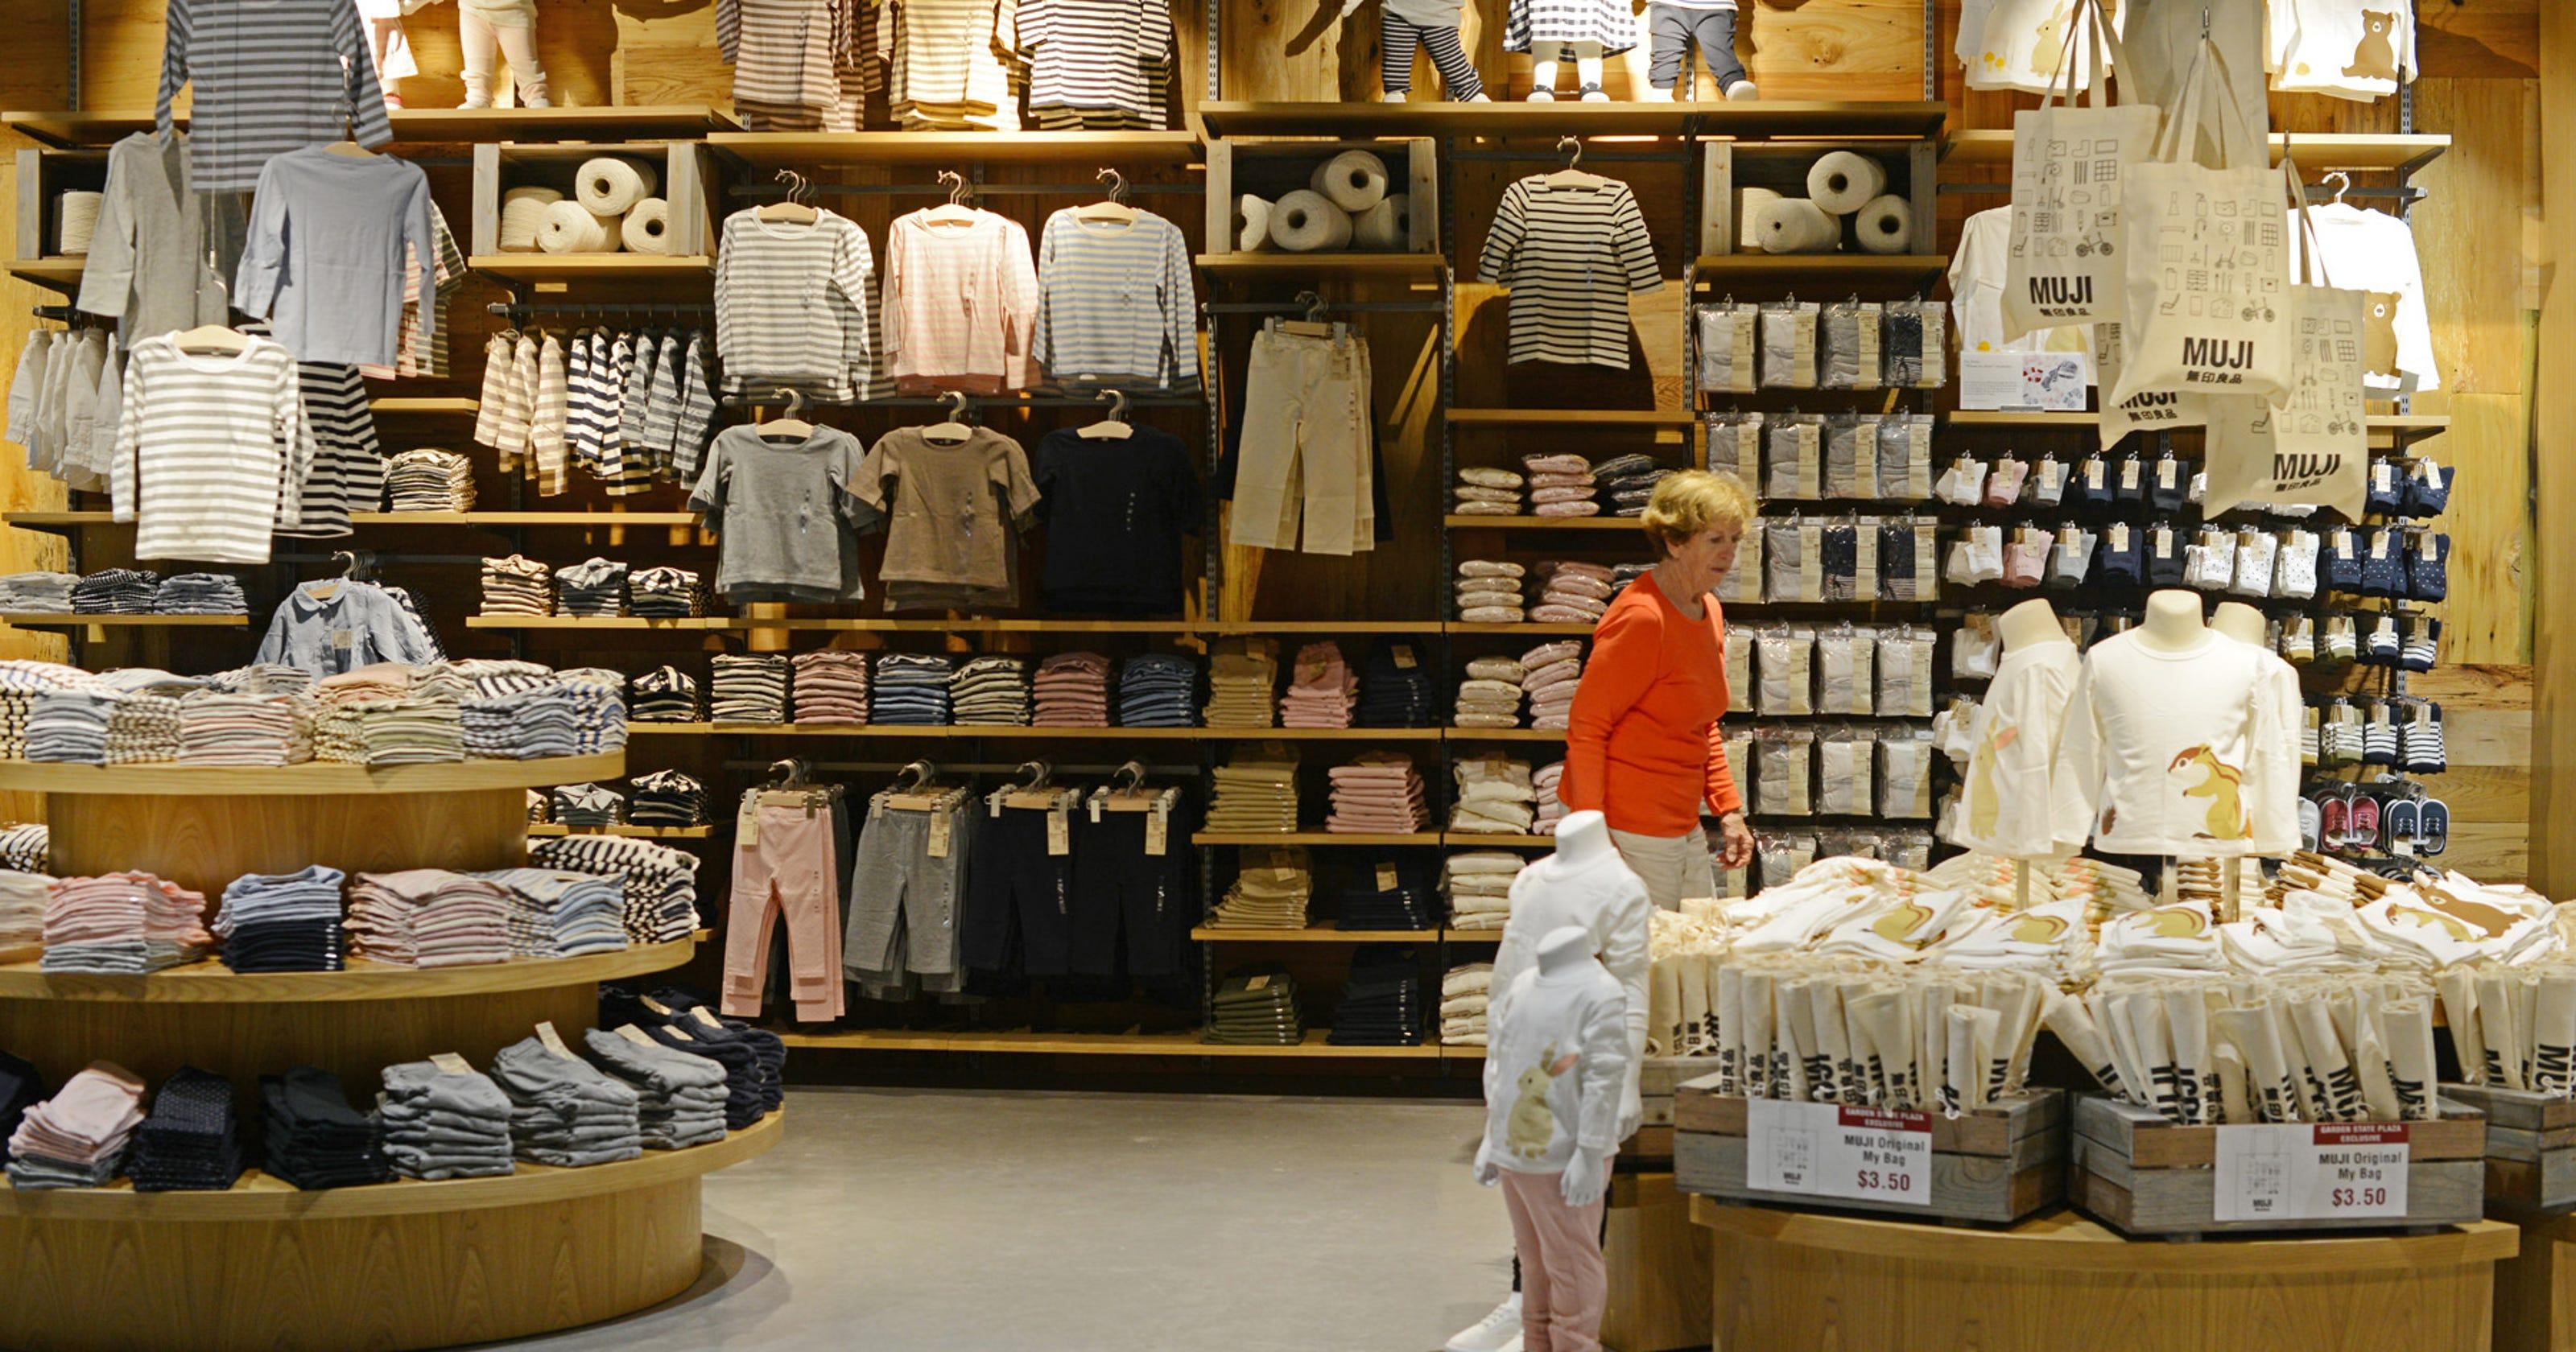 Muji brings Japanese vision to first NJ store